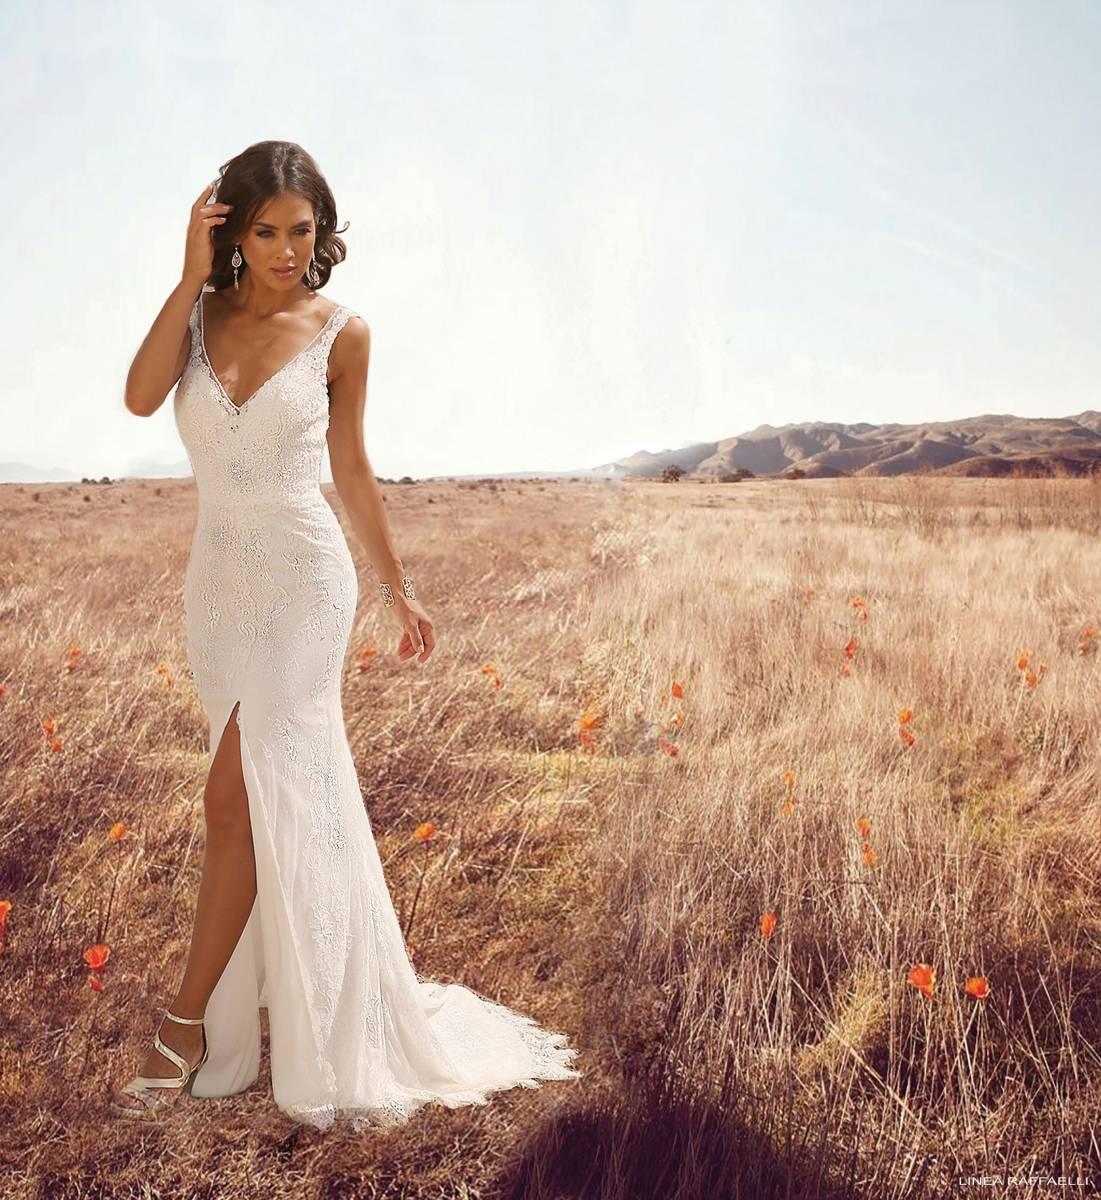 Maxim's Couture - Bruidsmode - Bruidsmodewinkel - Trouwjurk - House of Weddings - 3